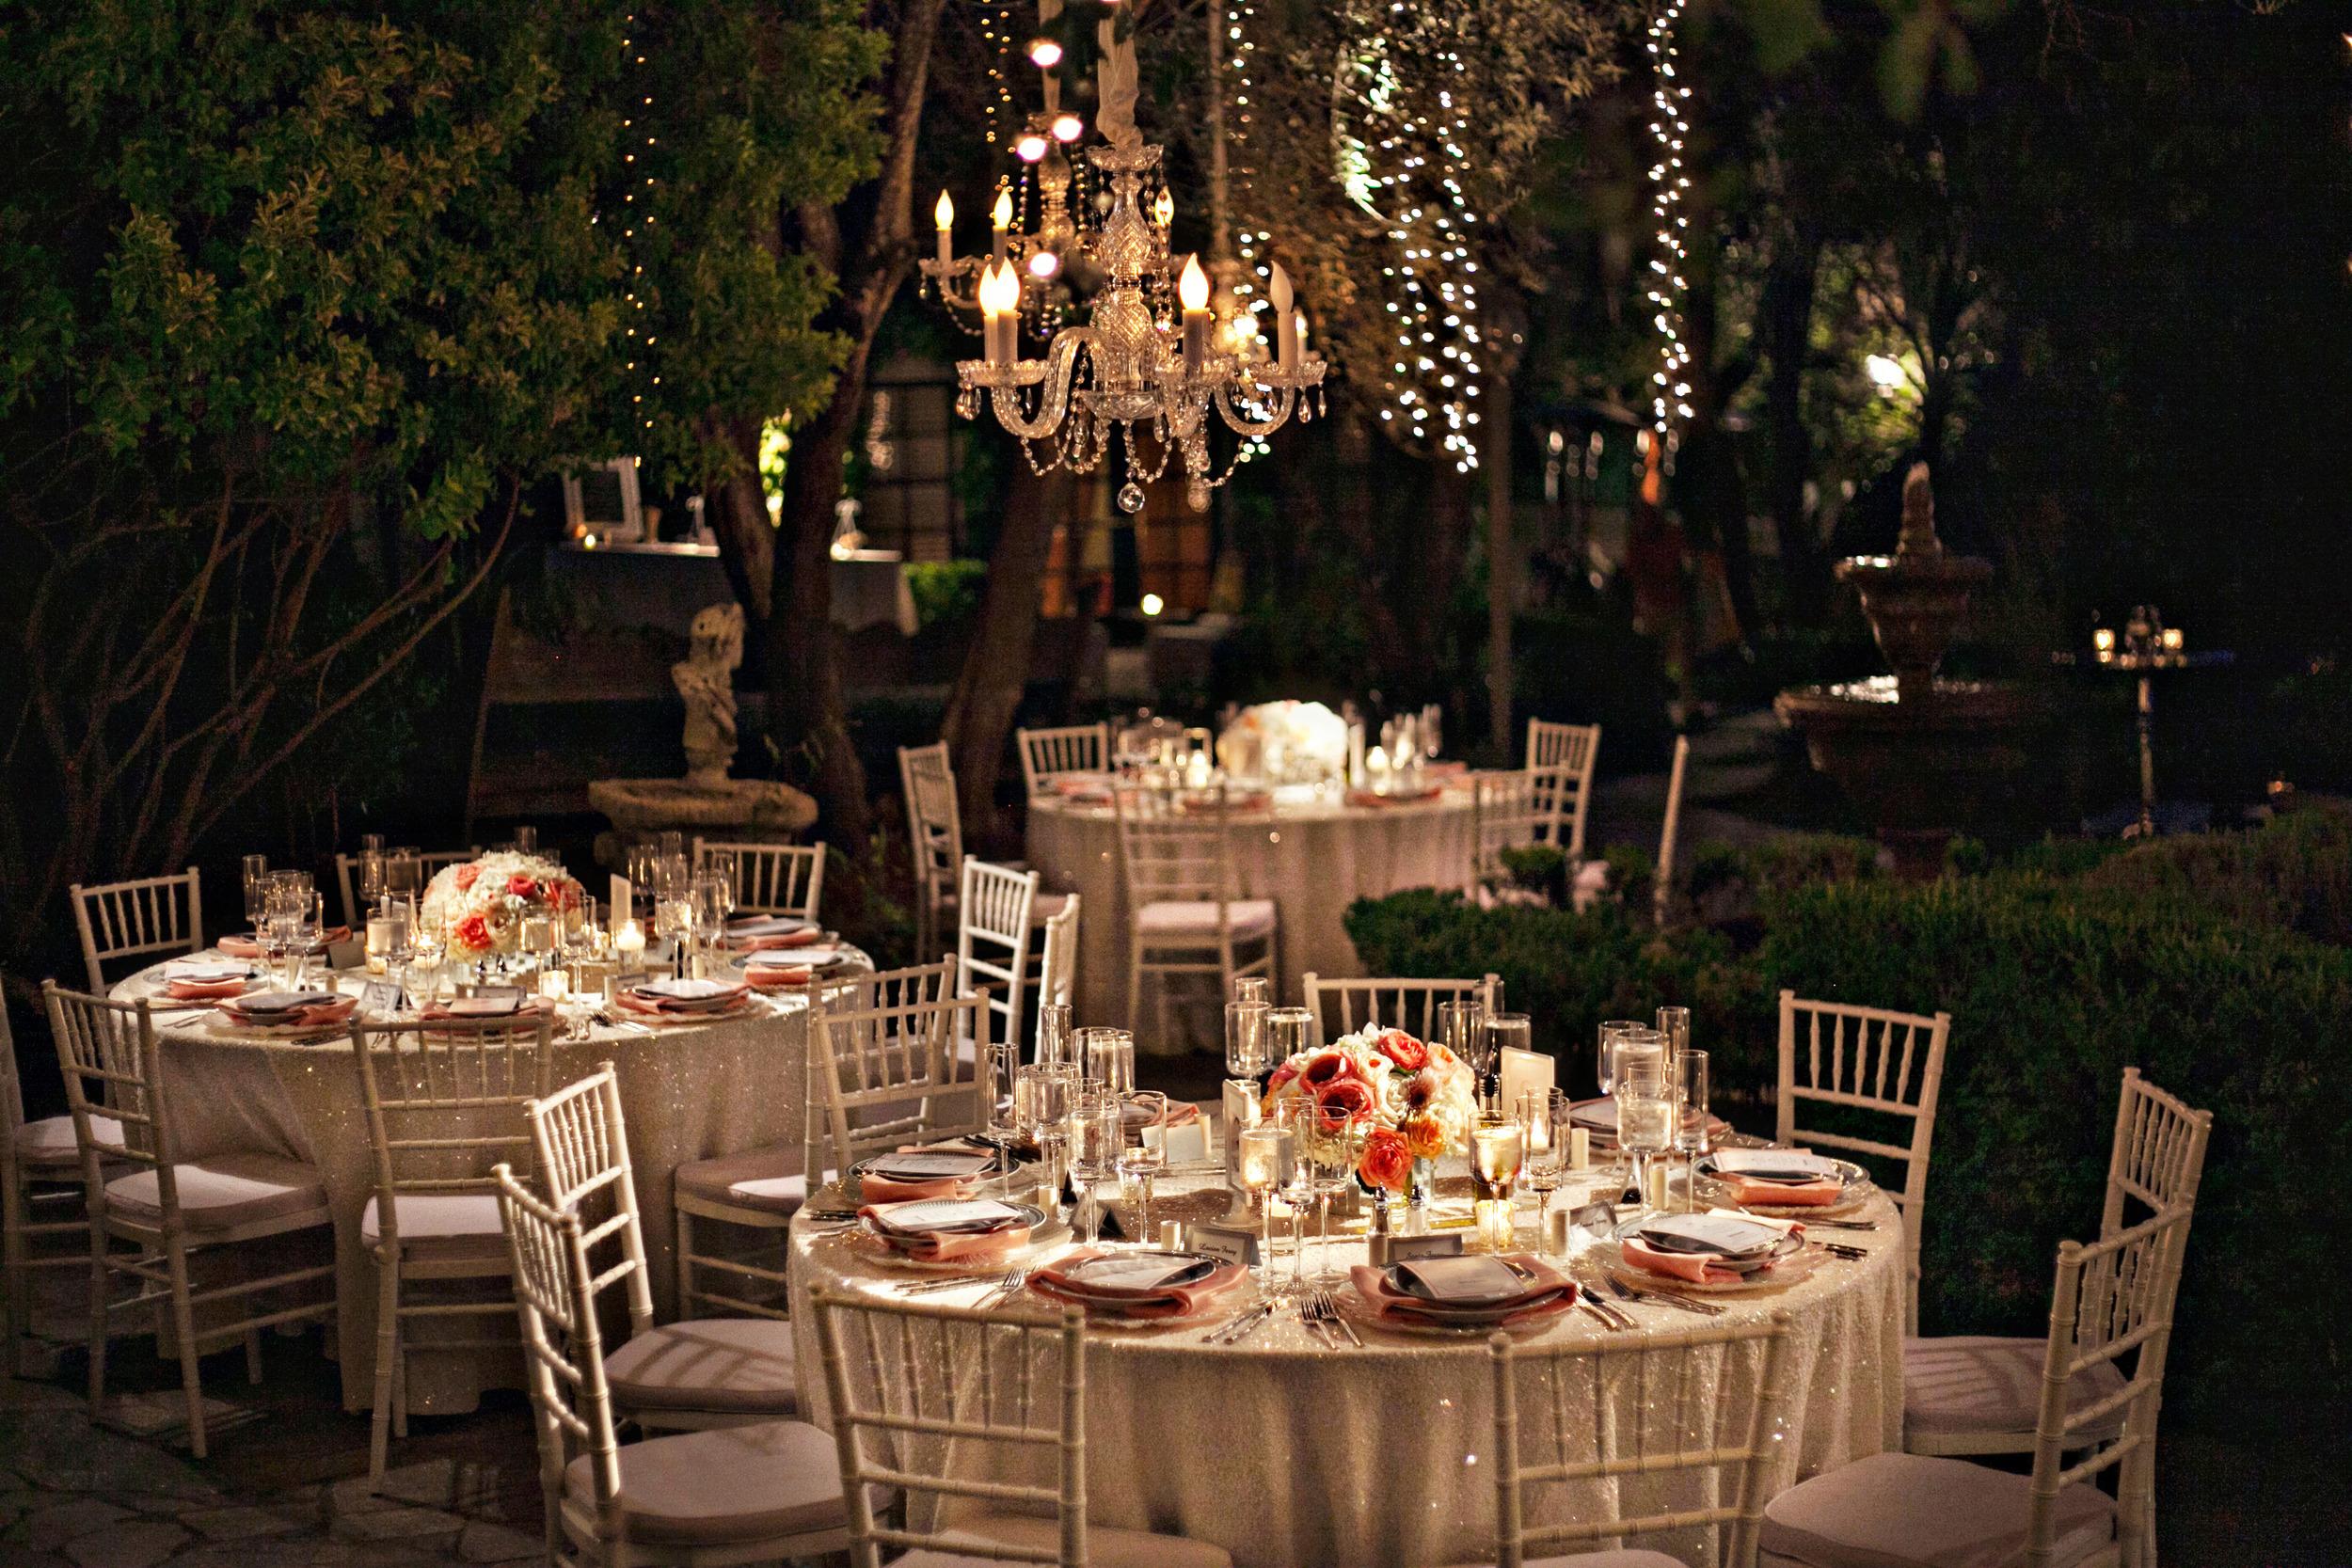 25. Summer wedding, wedding chandaliers, hanging fairly lights, sequin tablecloths, sparkle wedding, peach & coral wedding.jpg